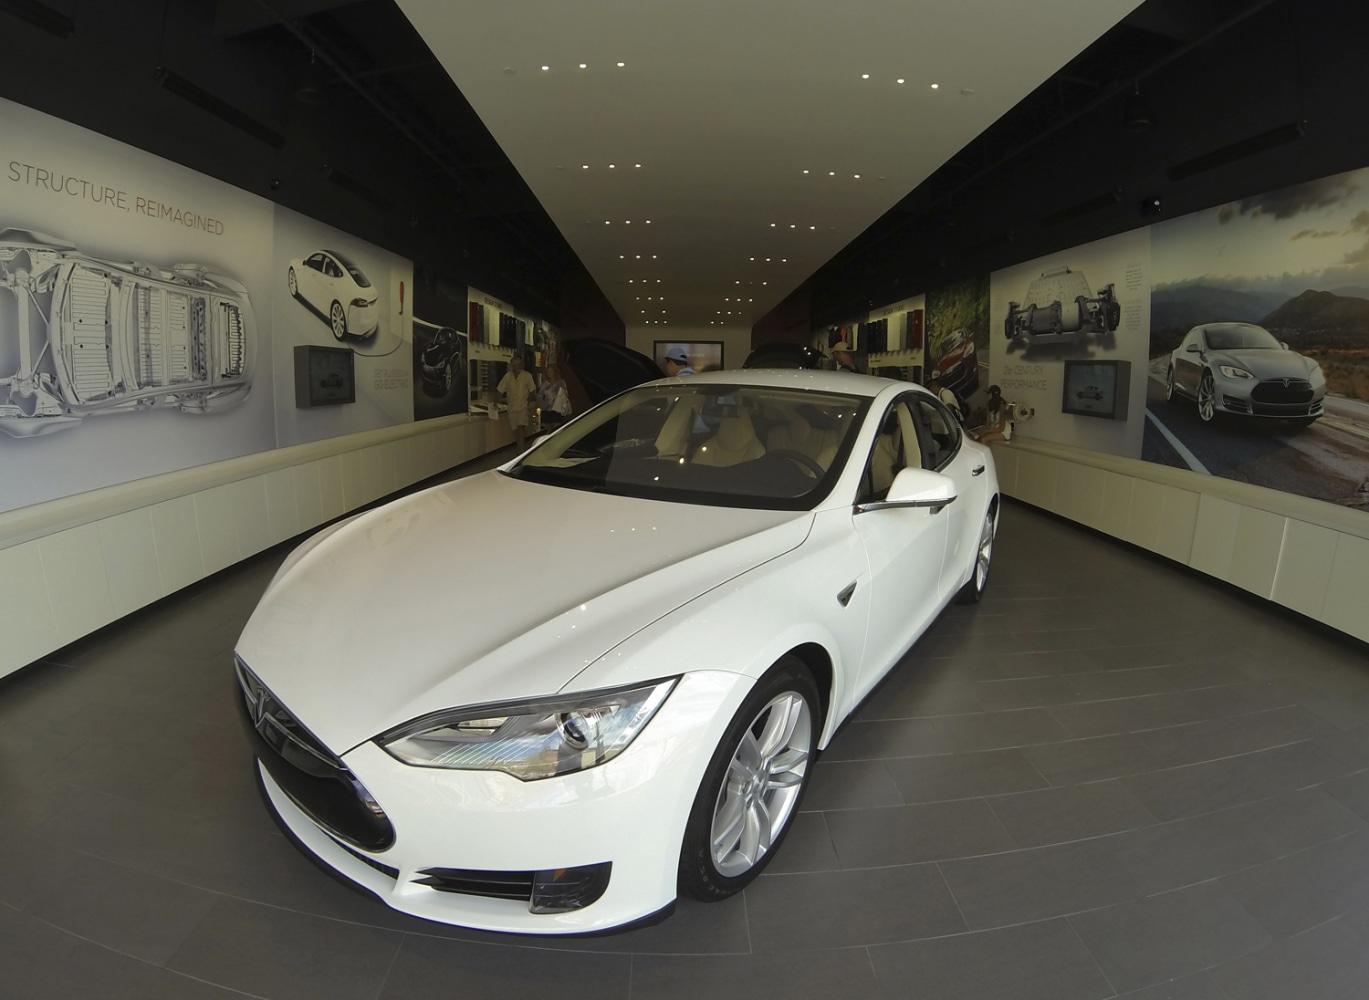 Electric sale: Someone used bitcoins to buy a Tesla - NBC News